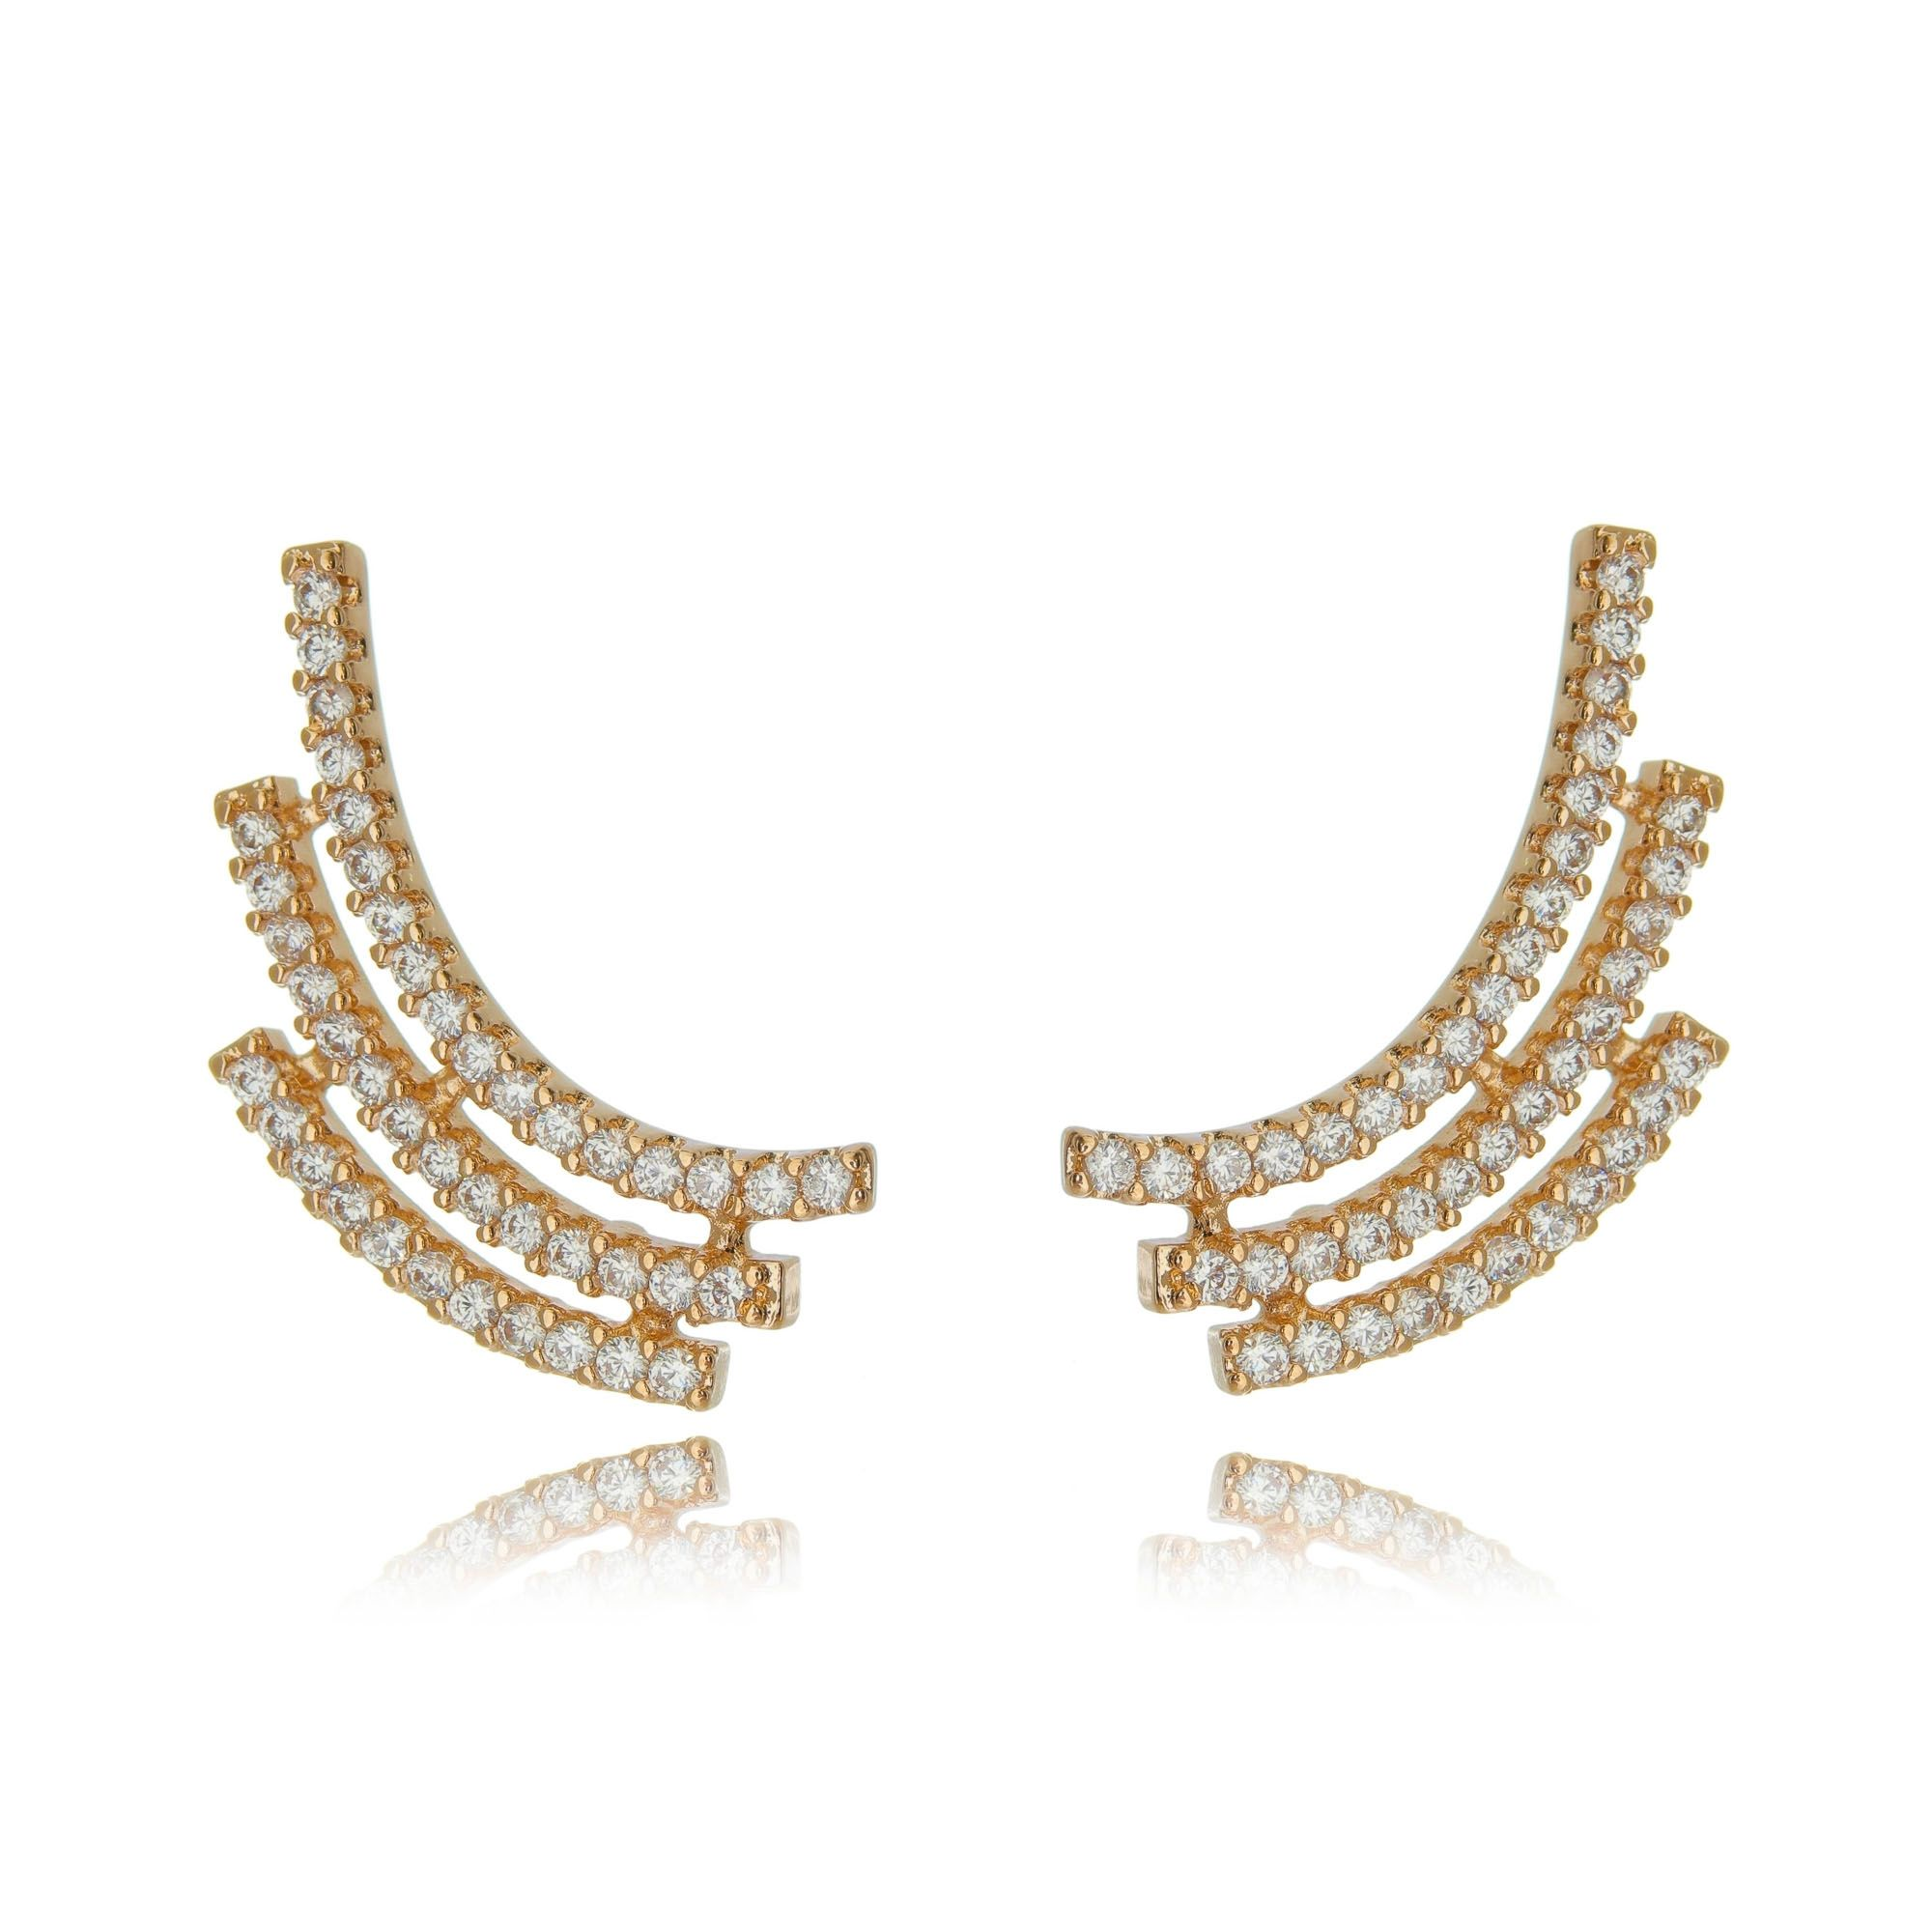 Ear Cuff Semijoia Ouro Rosé com Zircônia Branca  - Soloyou